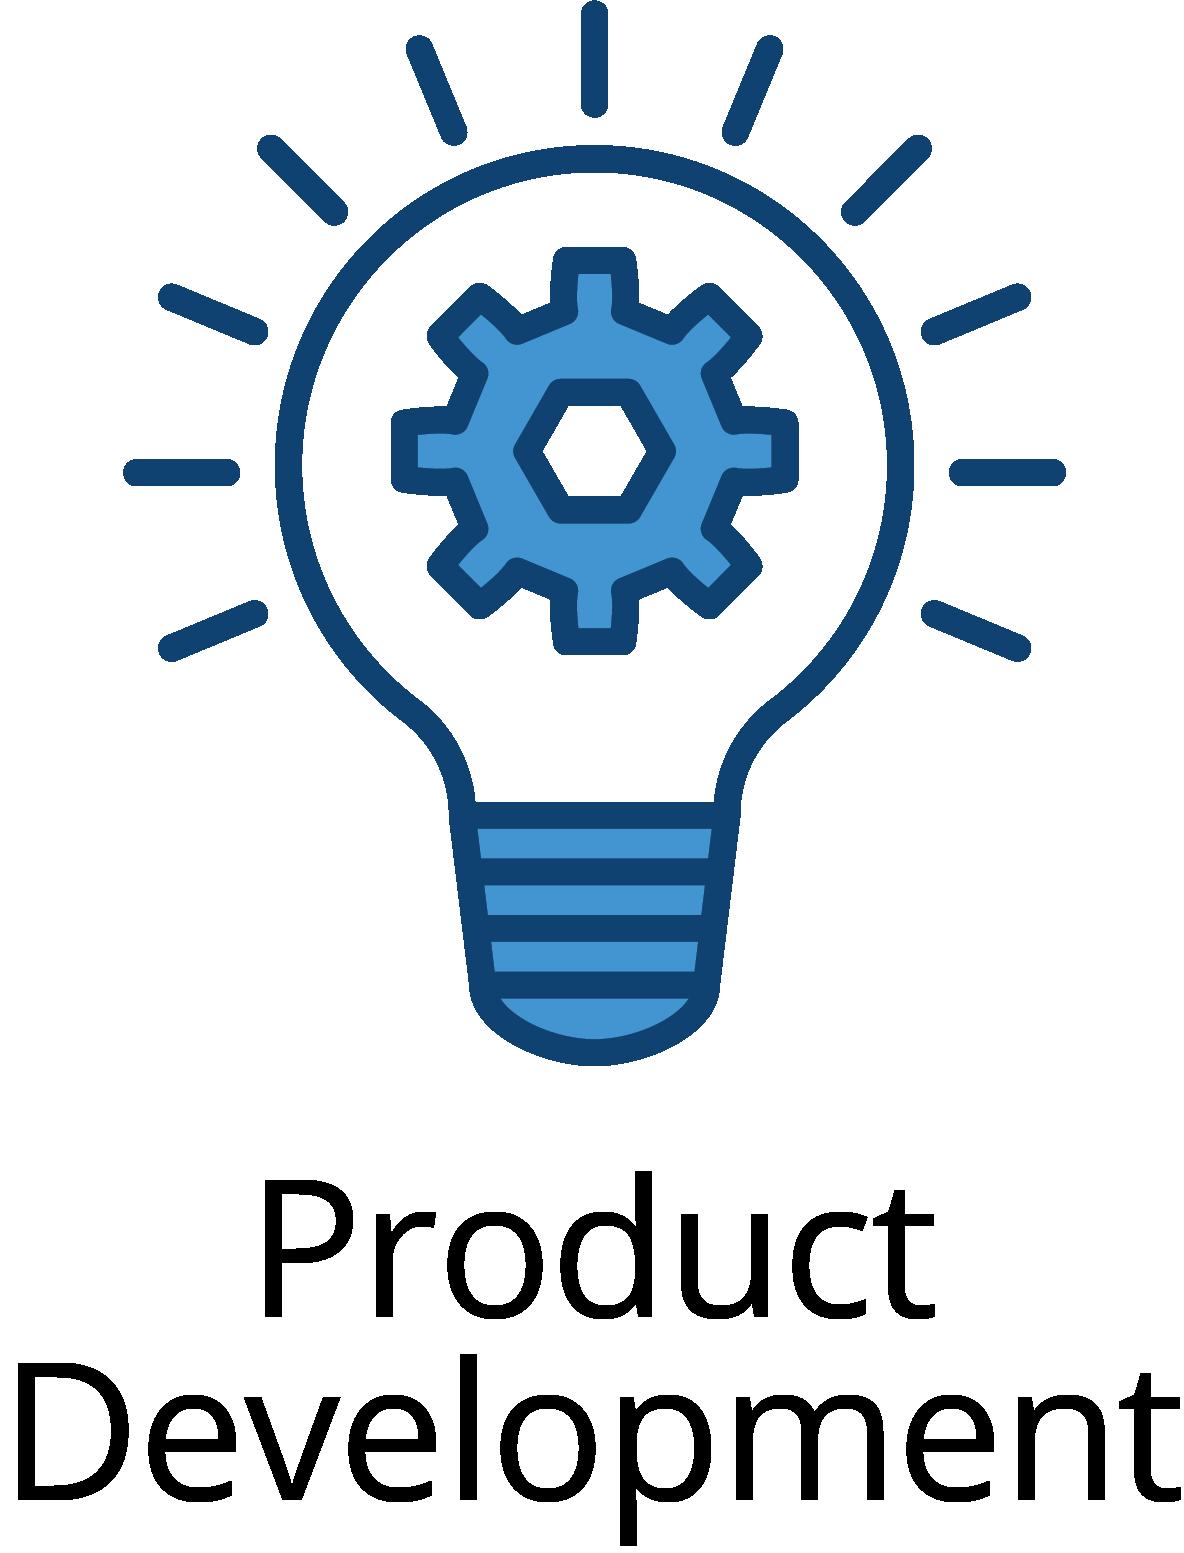 AminoMax Innovations in Product Development